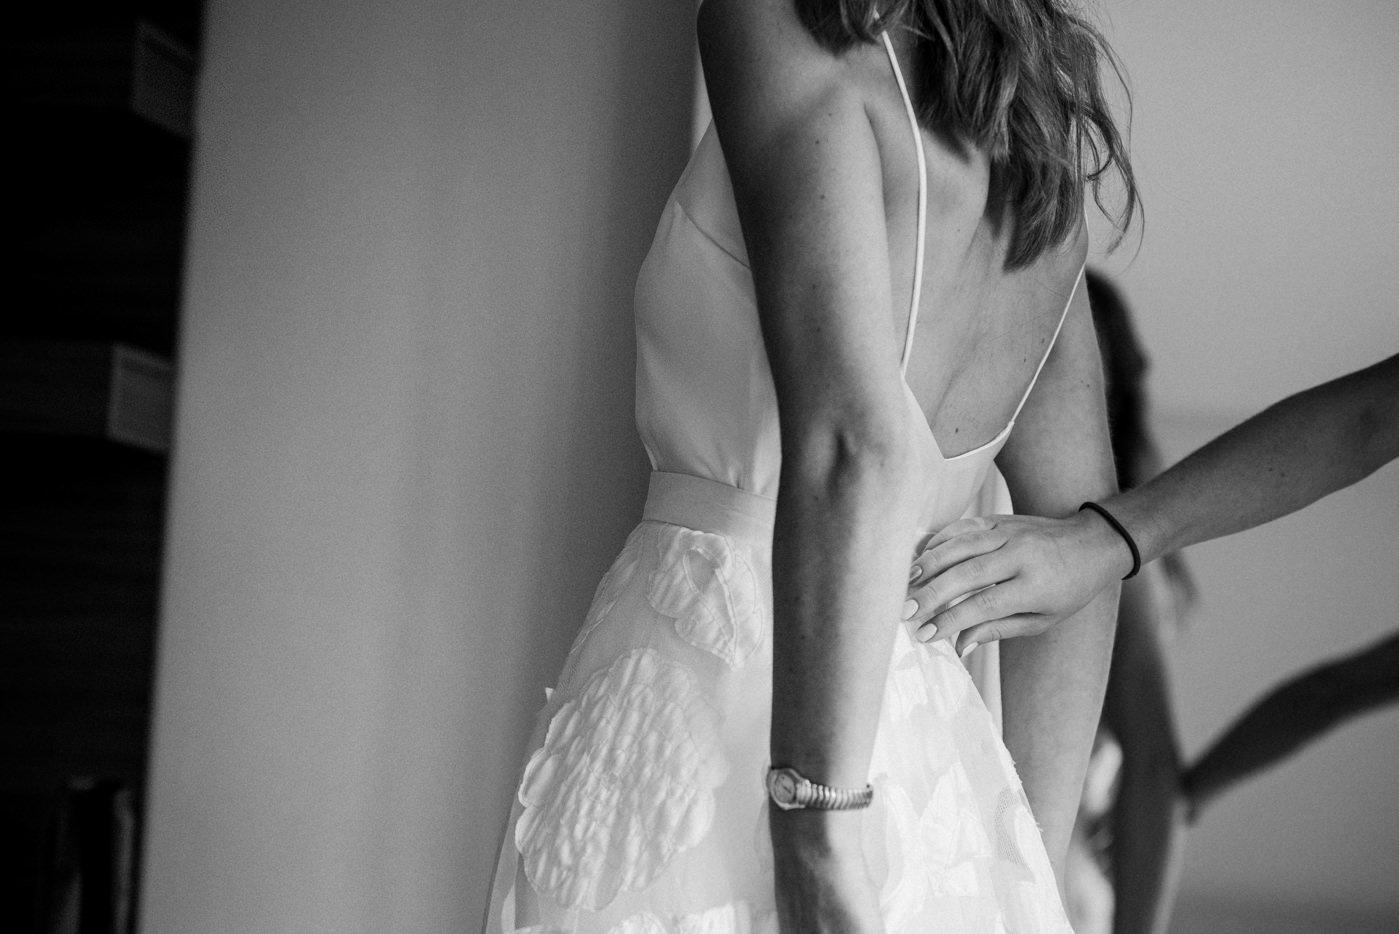 bignor-park-wedding-photography-robyn-and-tom-23